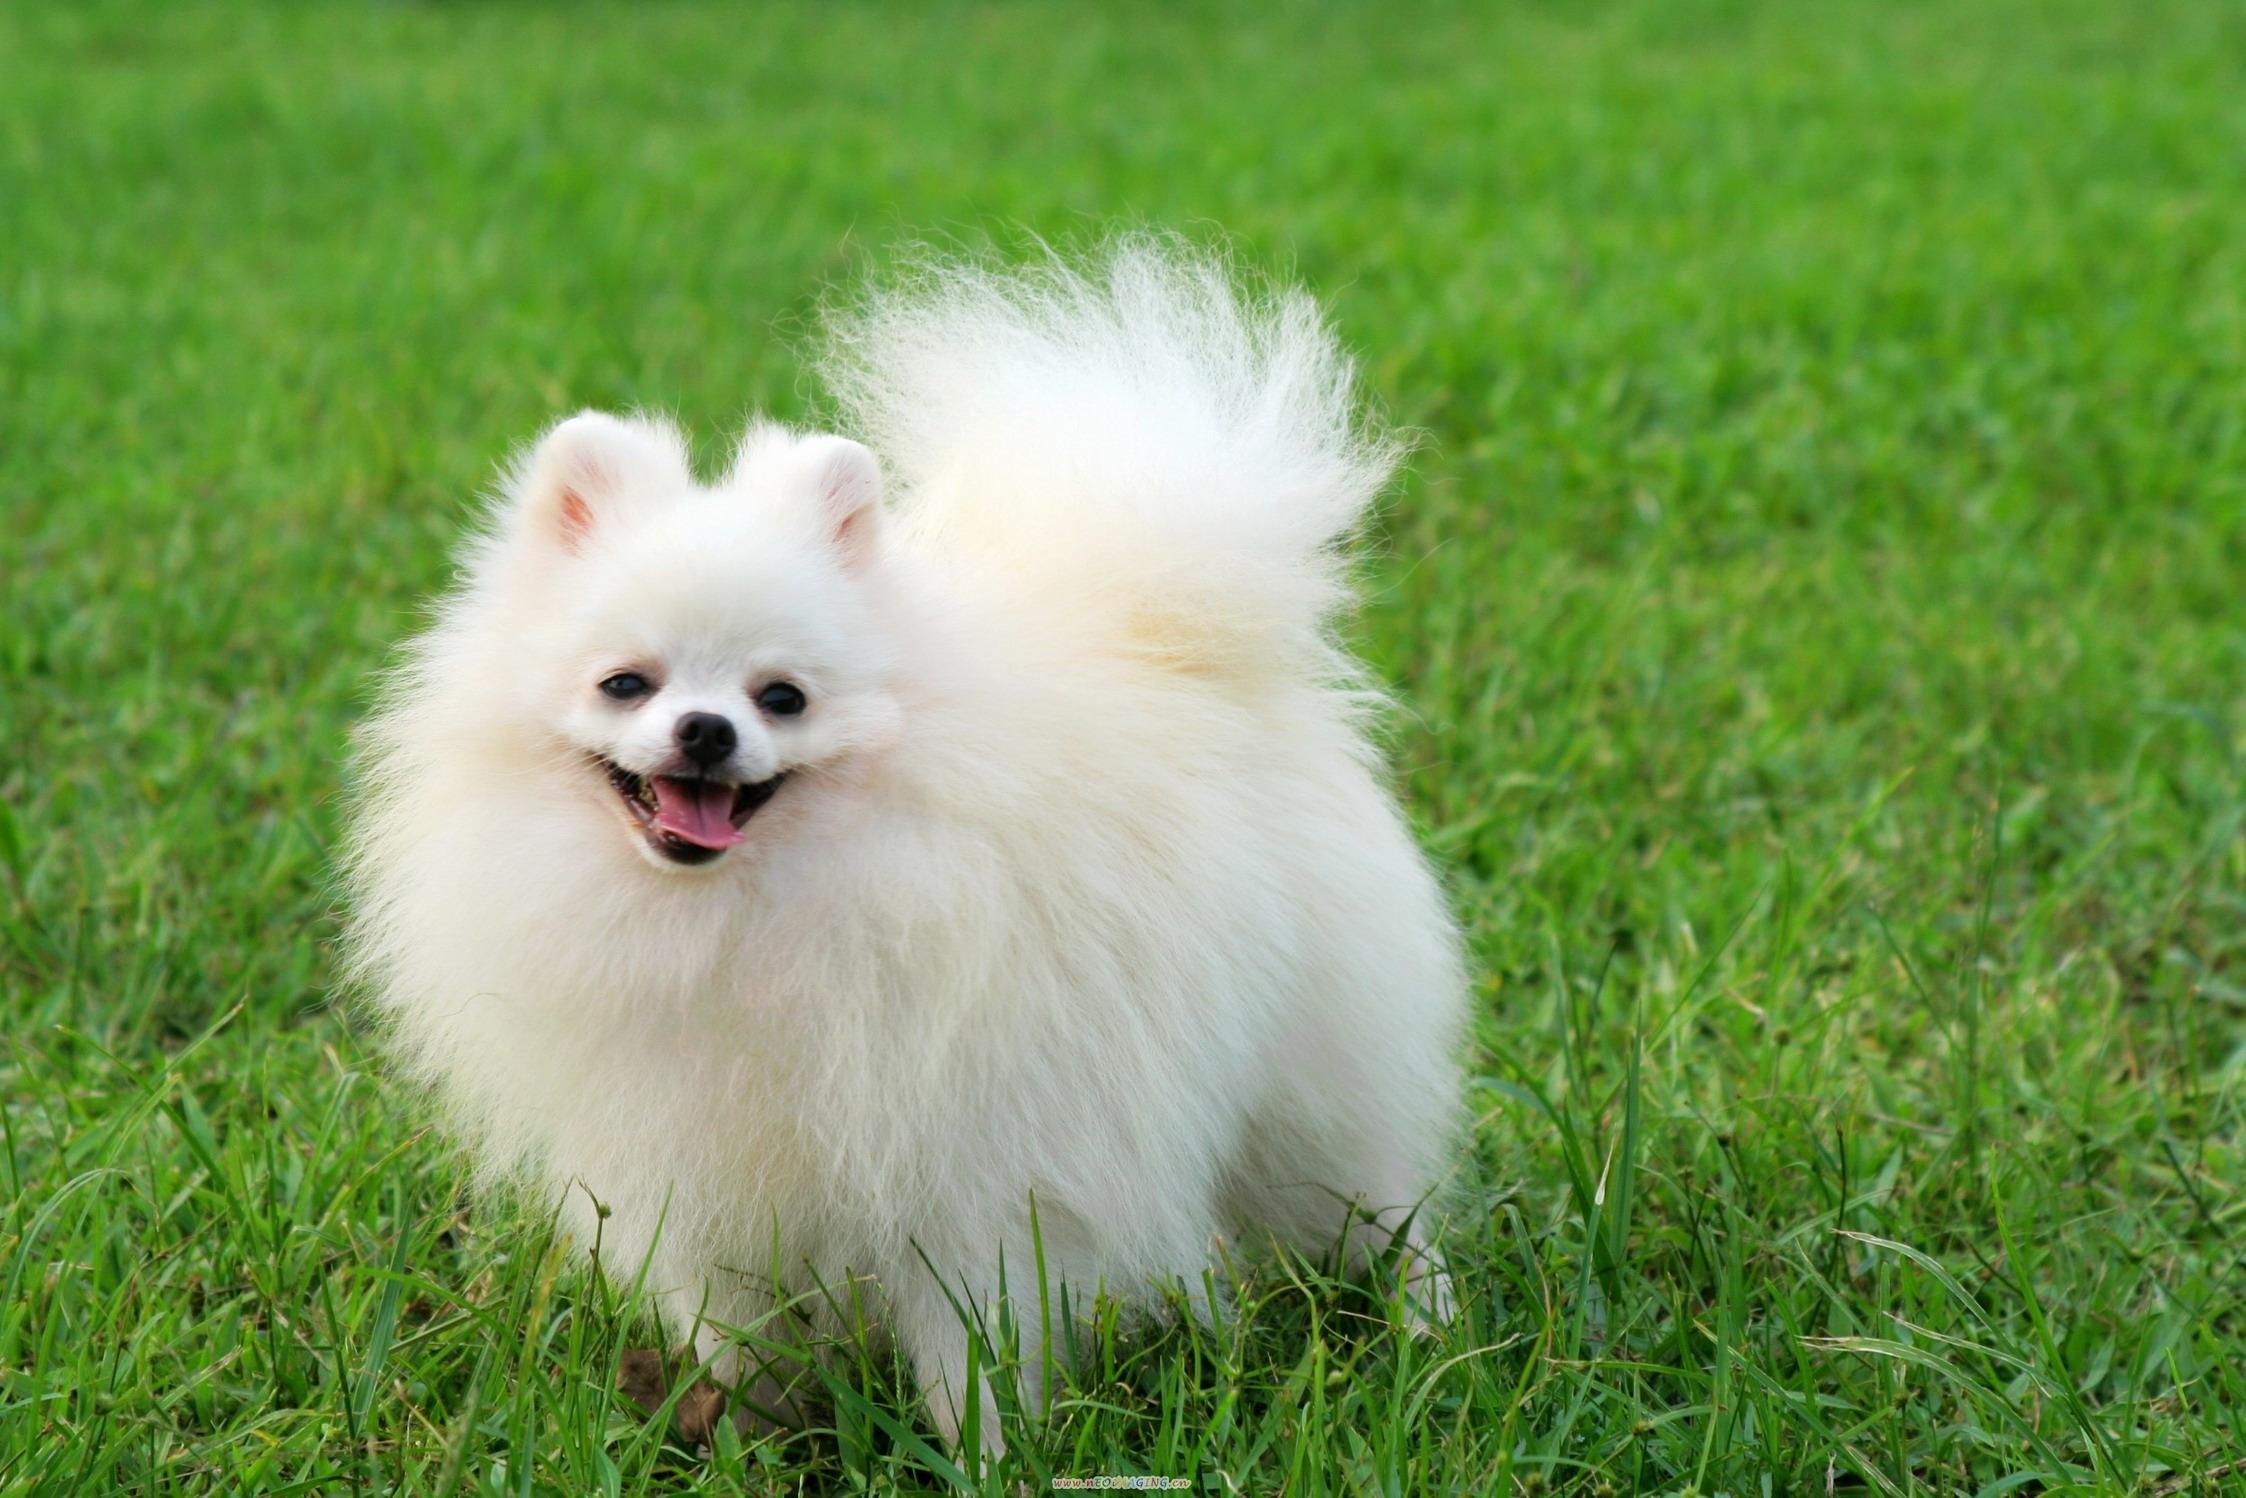 Pomeranian Cute Dog White Colour 1200x800 Download Hd Wallpaper Wallpapertip